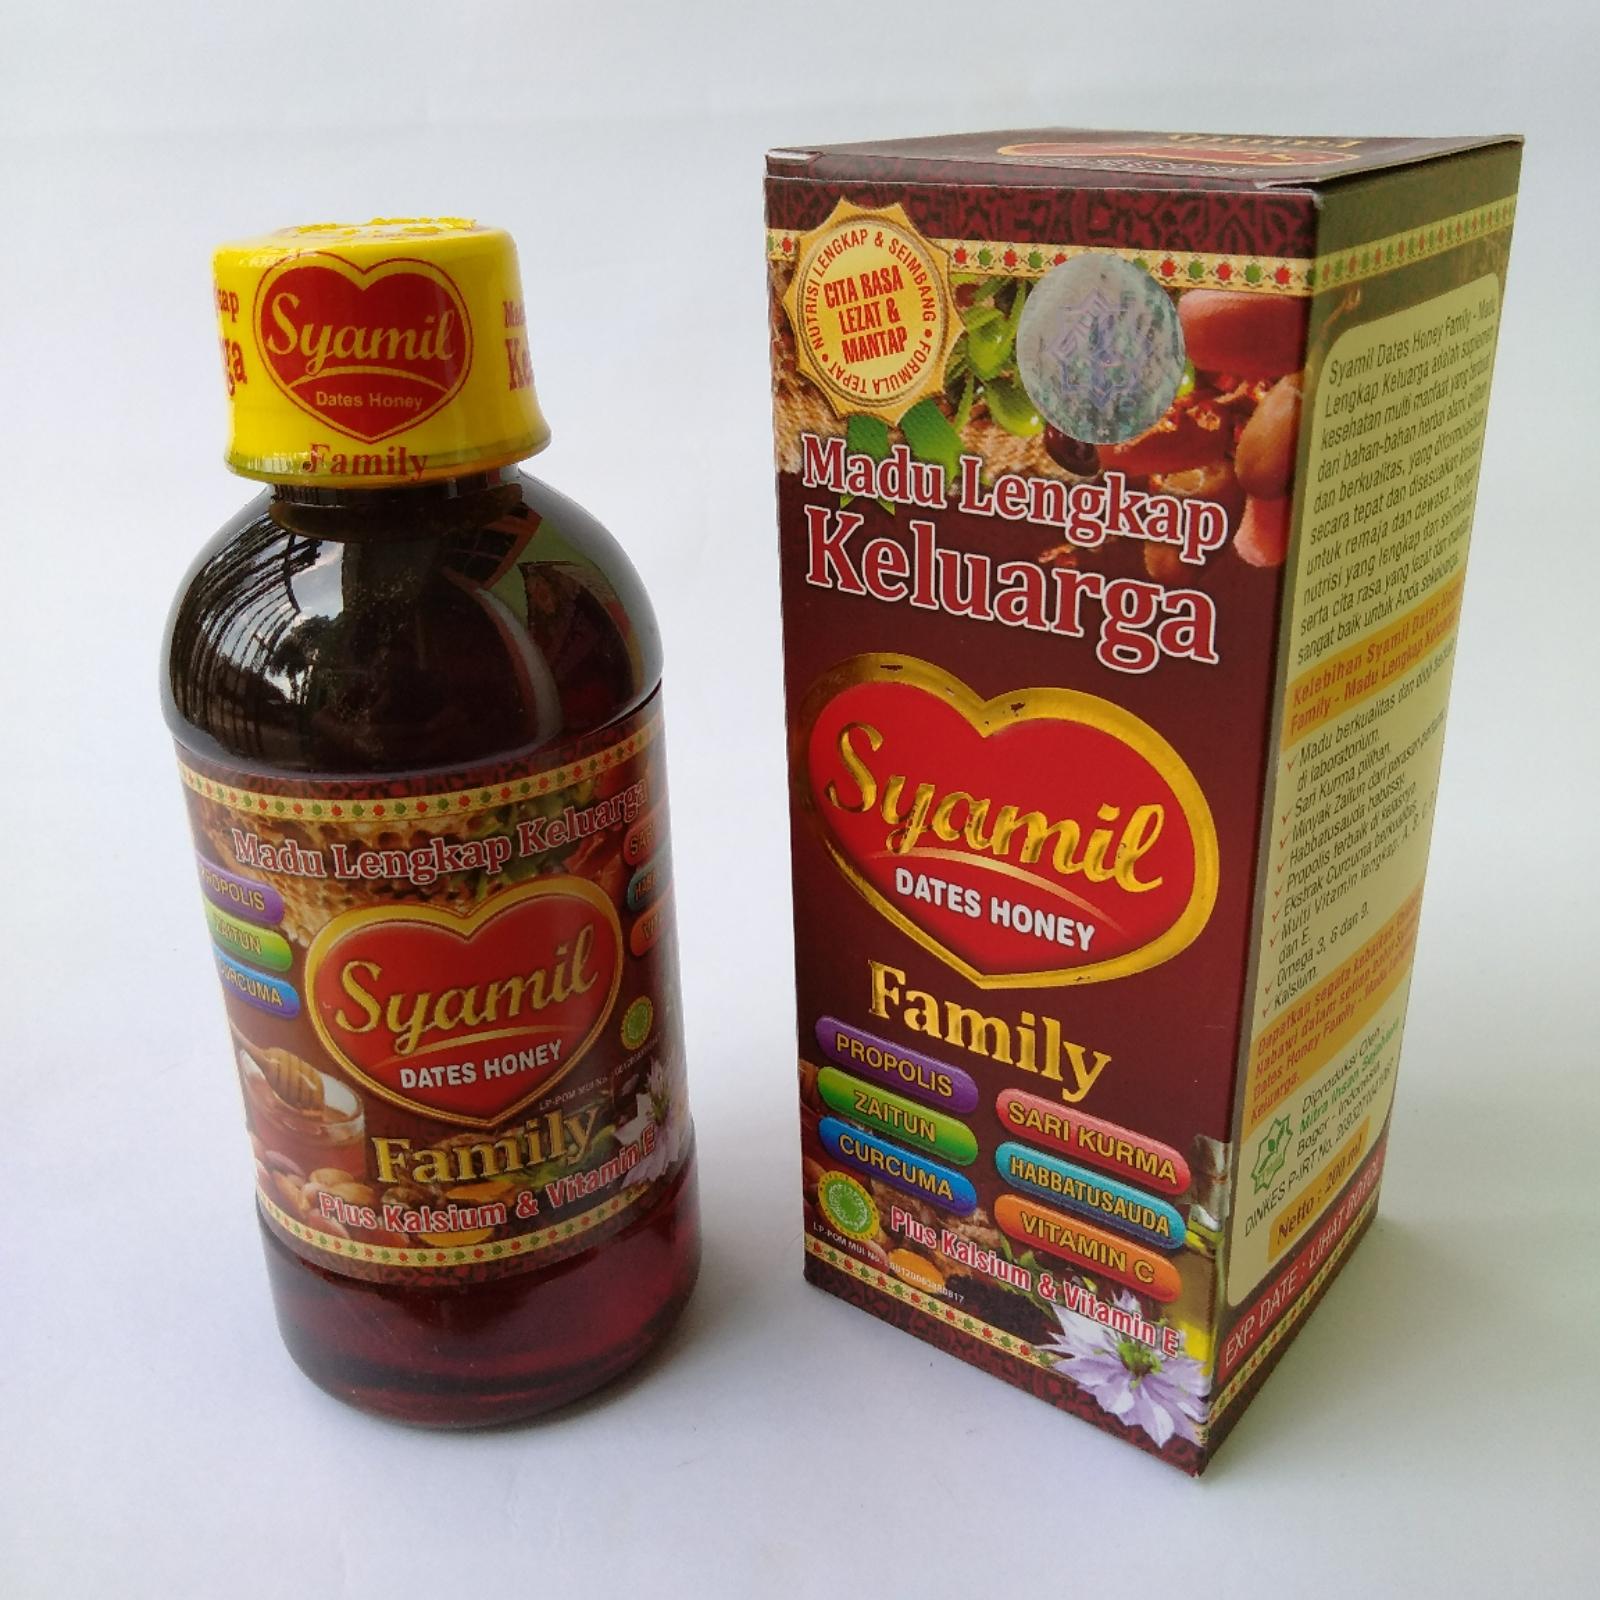 Syamil Madu Lengkap Keluarga Dates Honey 200 Ml Beli Harga Si Buah Hati Family Rp30000